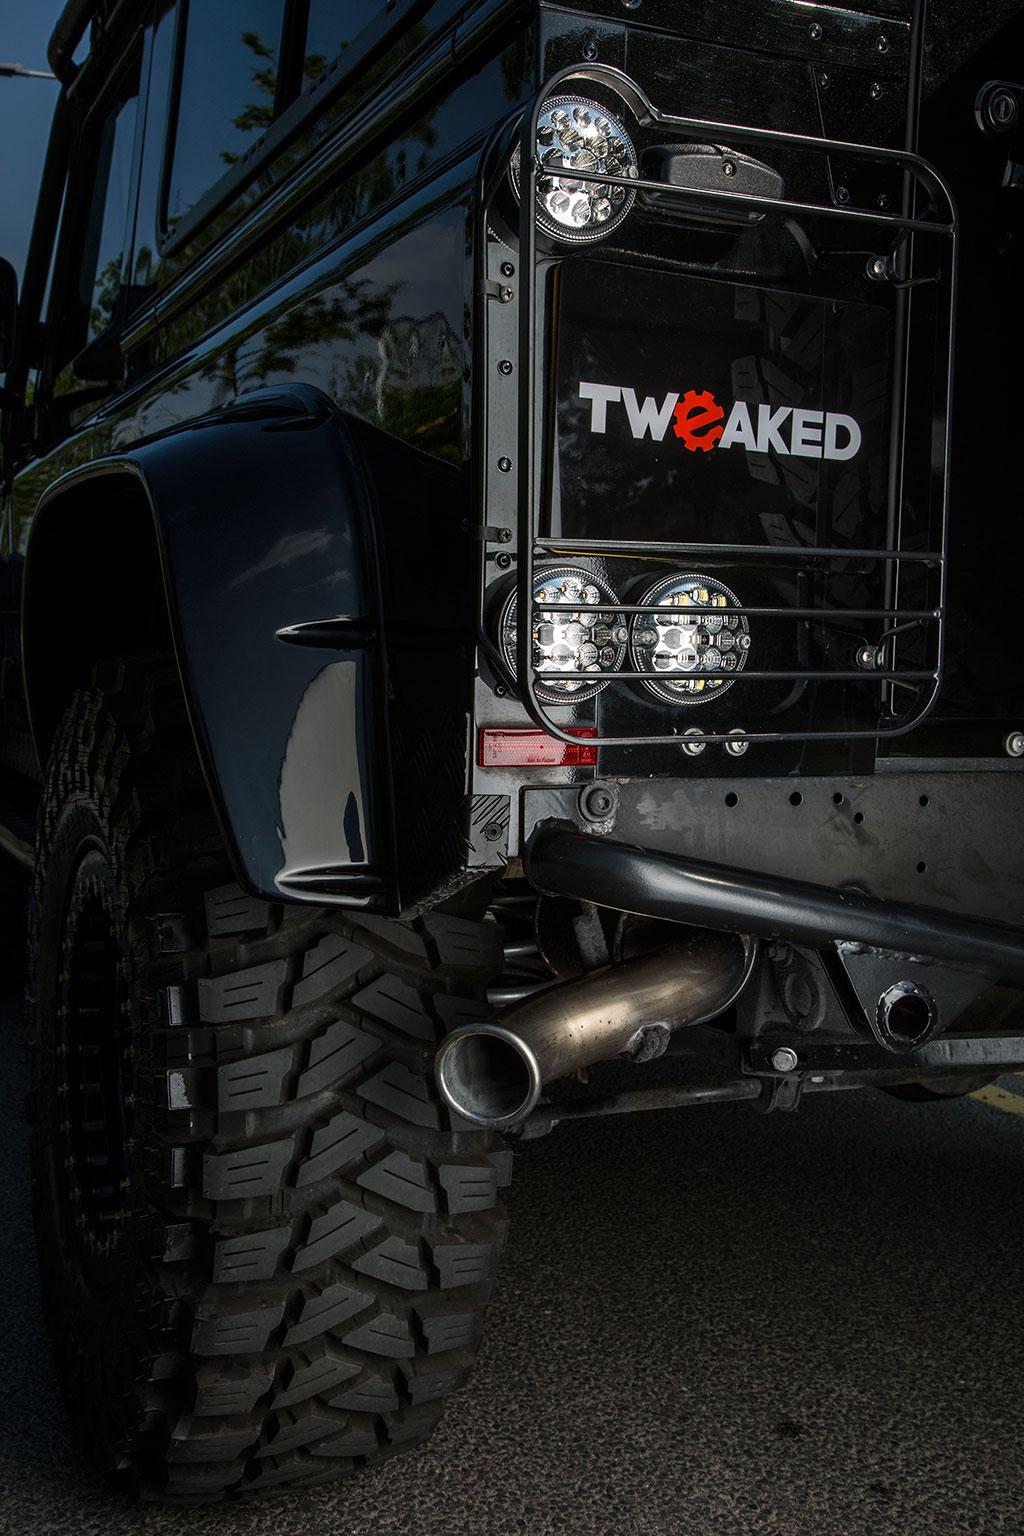 tweaked-land-rover-spectre-5